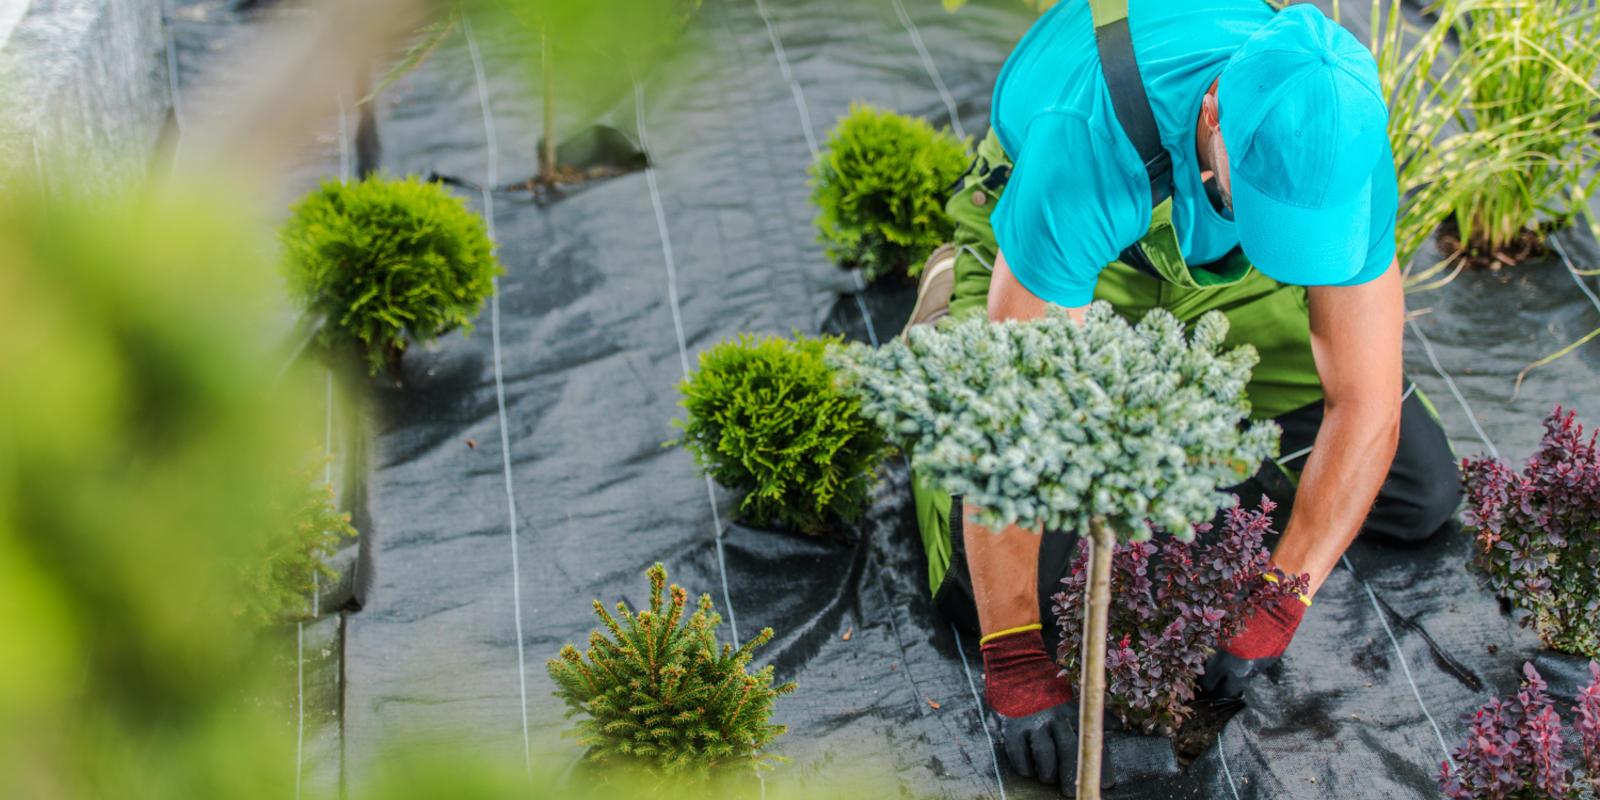 wat kost tuin aanleggen